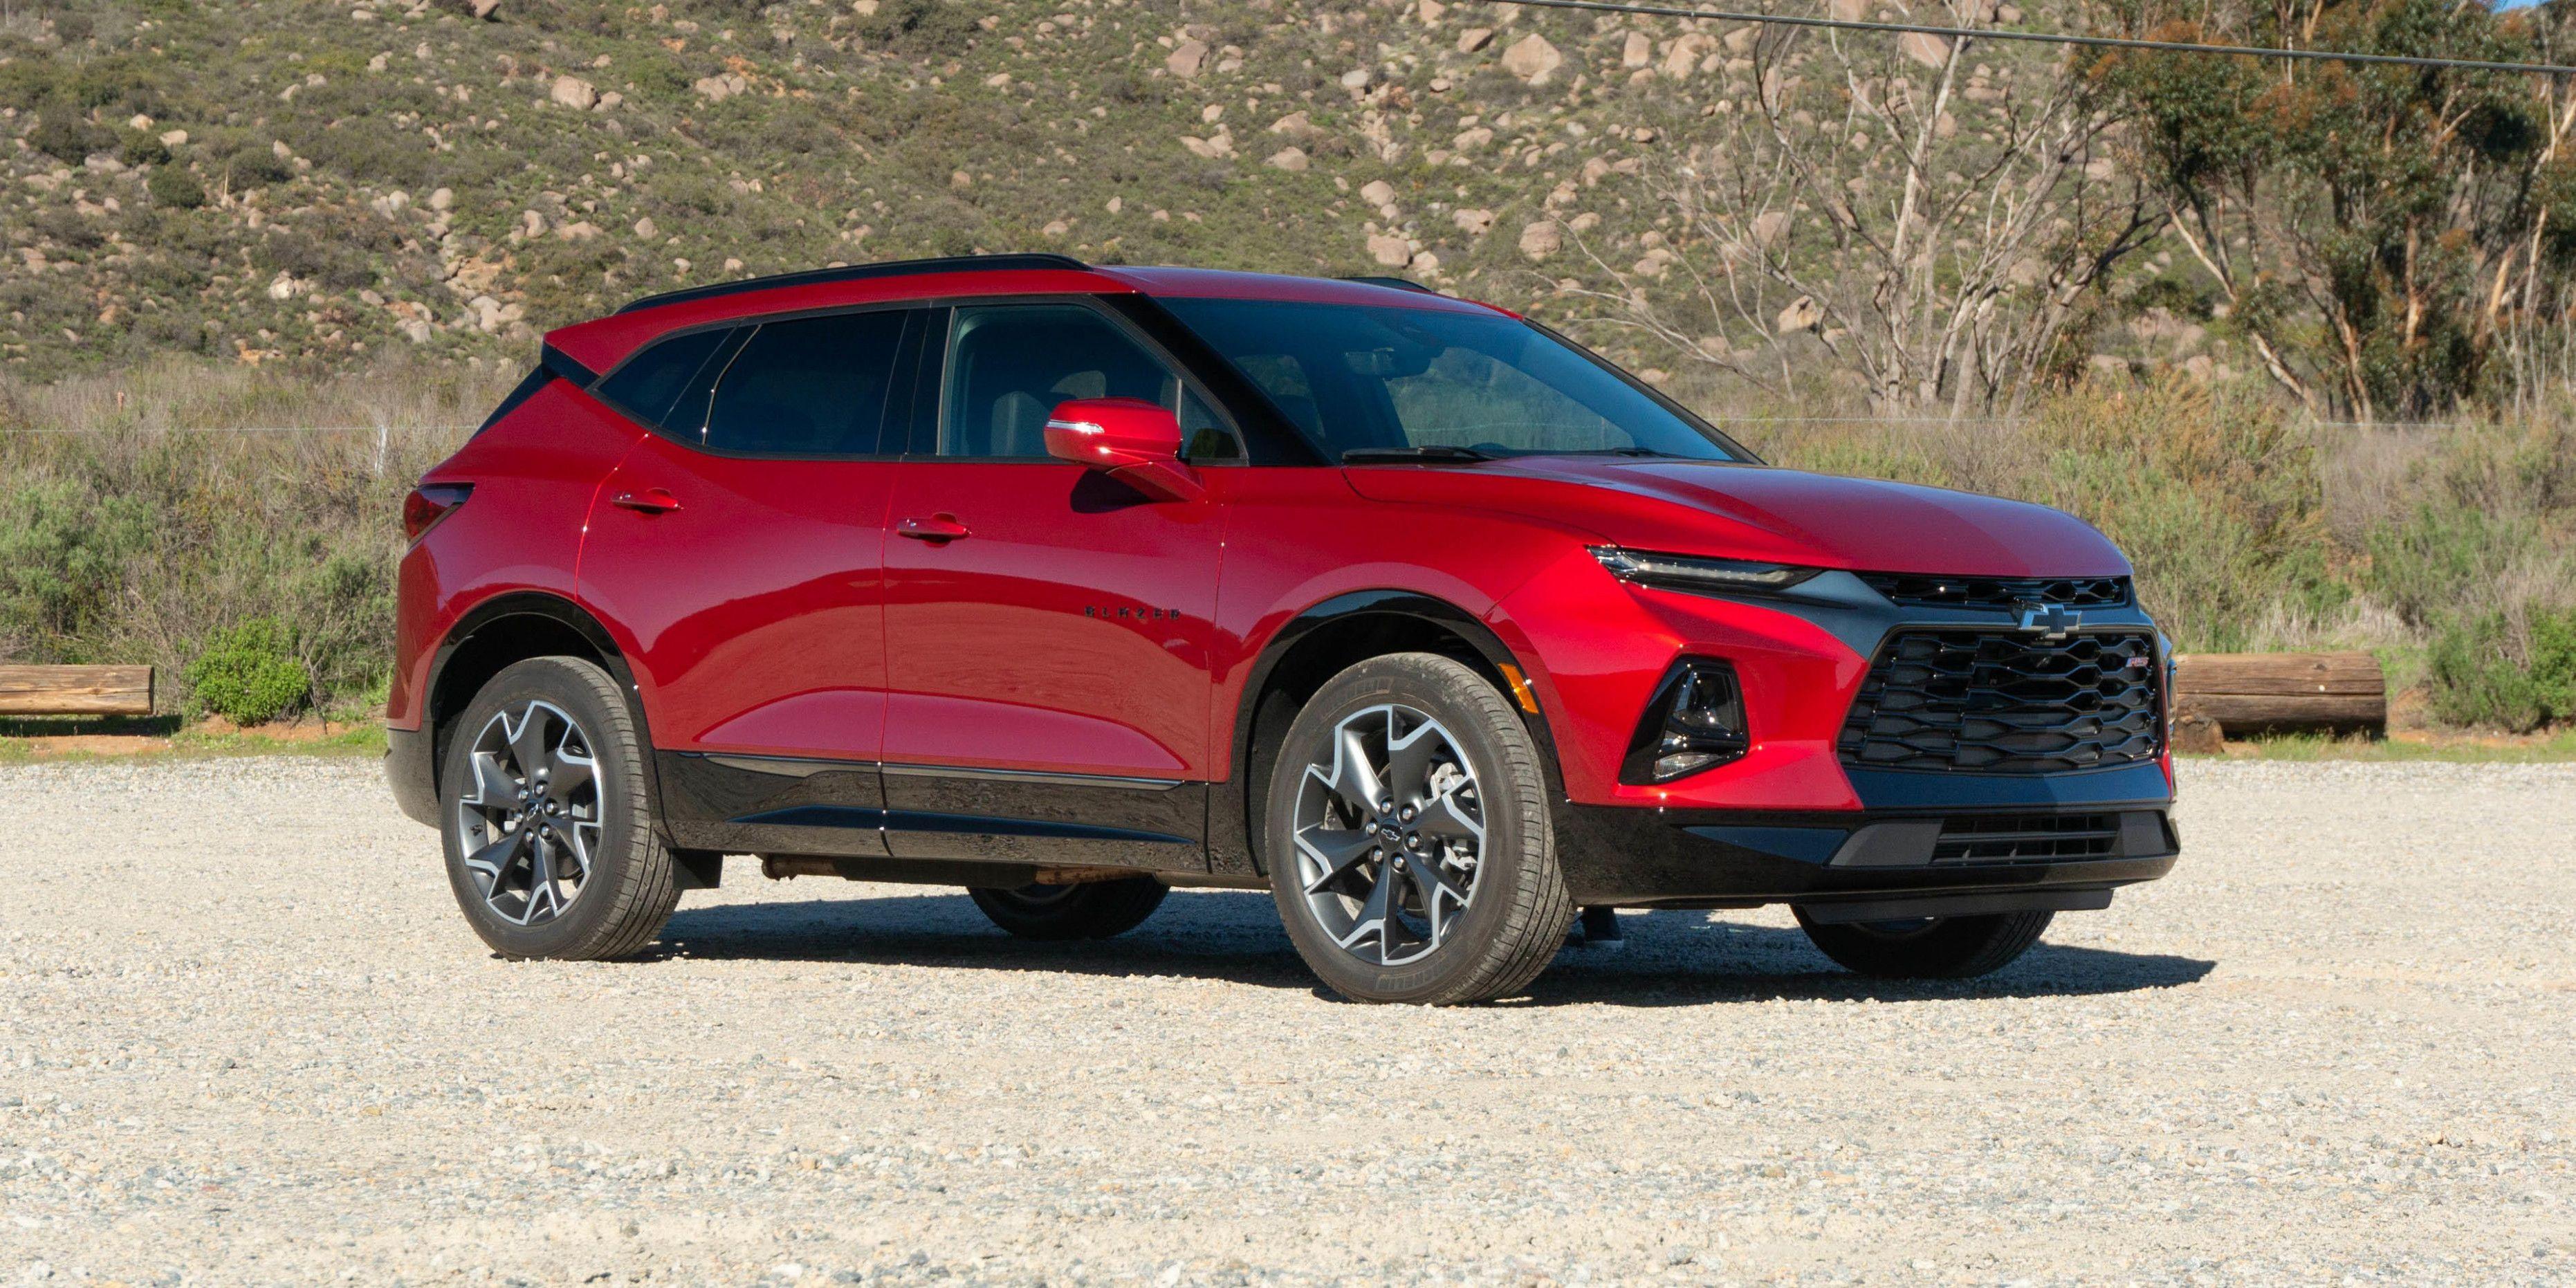 9 Image 2020 Chevrolet Blazer Gas Mileage In 2020 Chevrolet